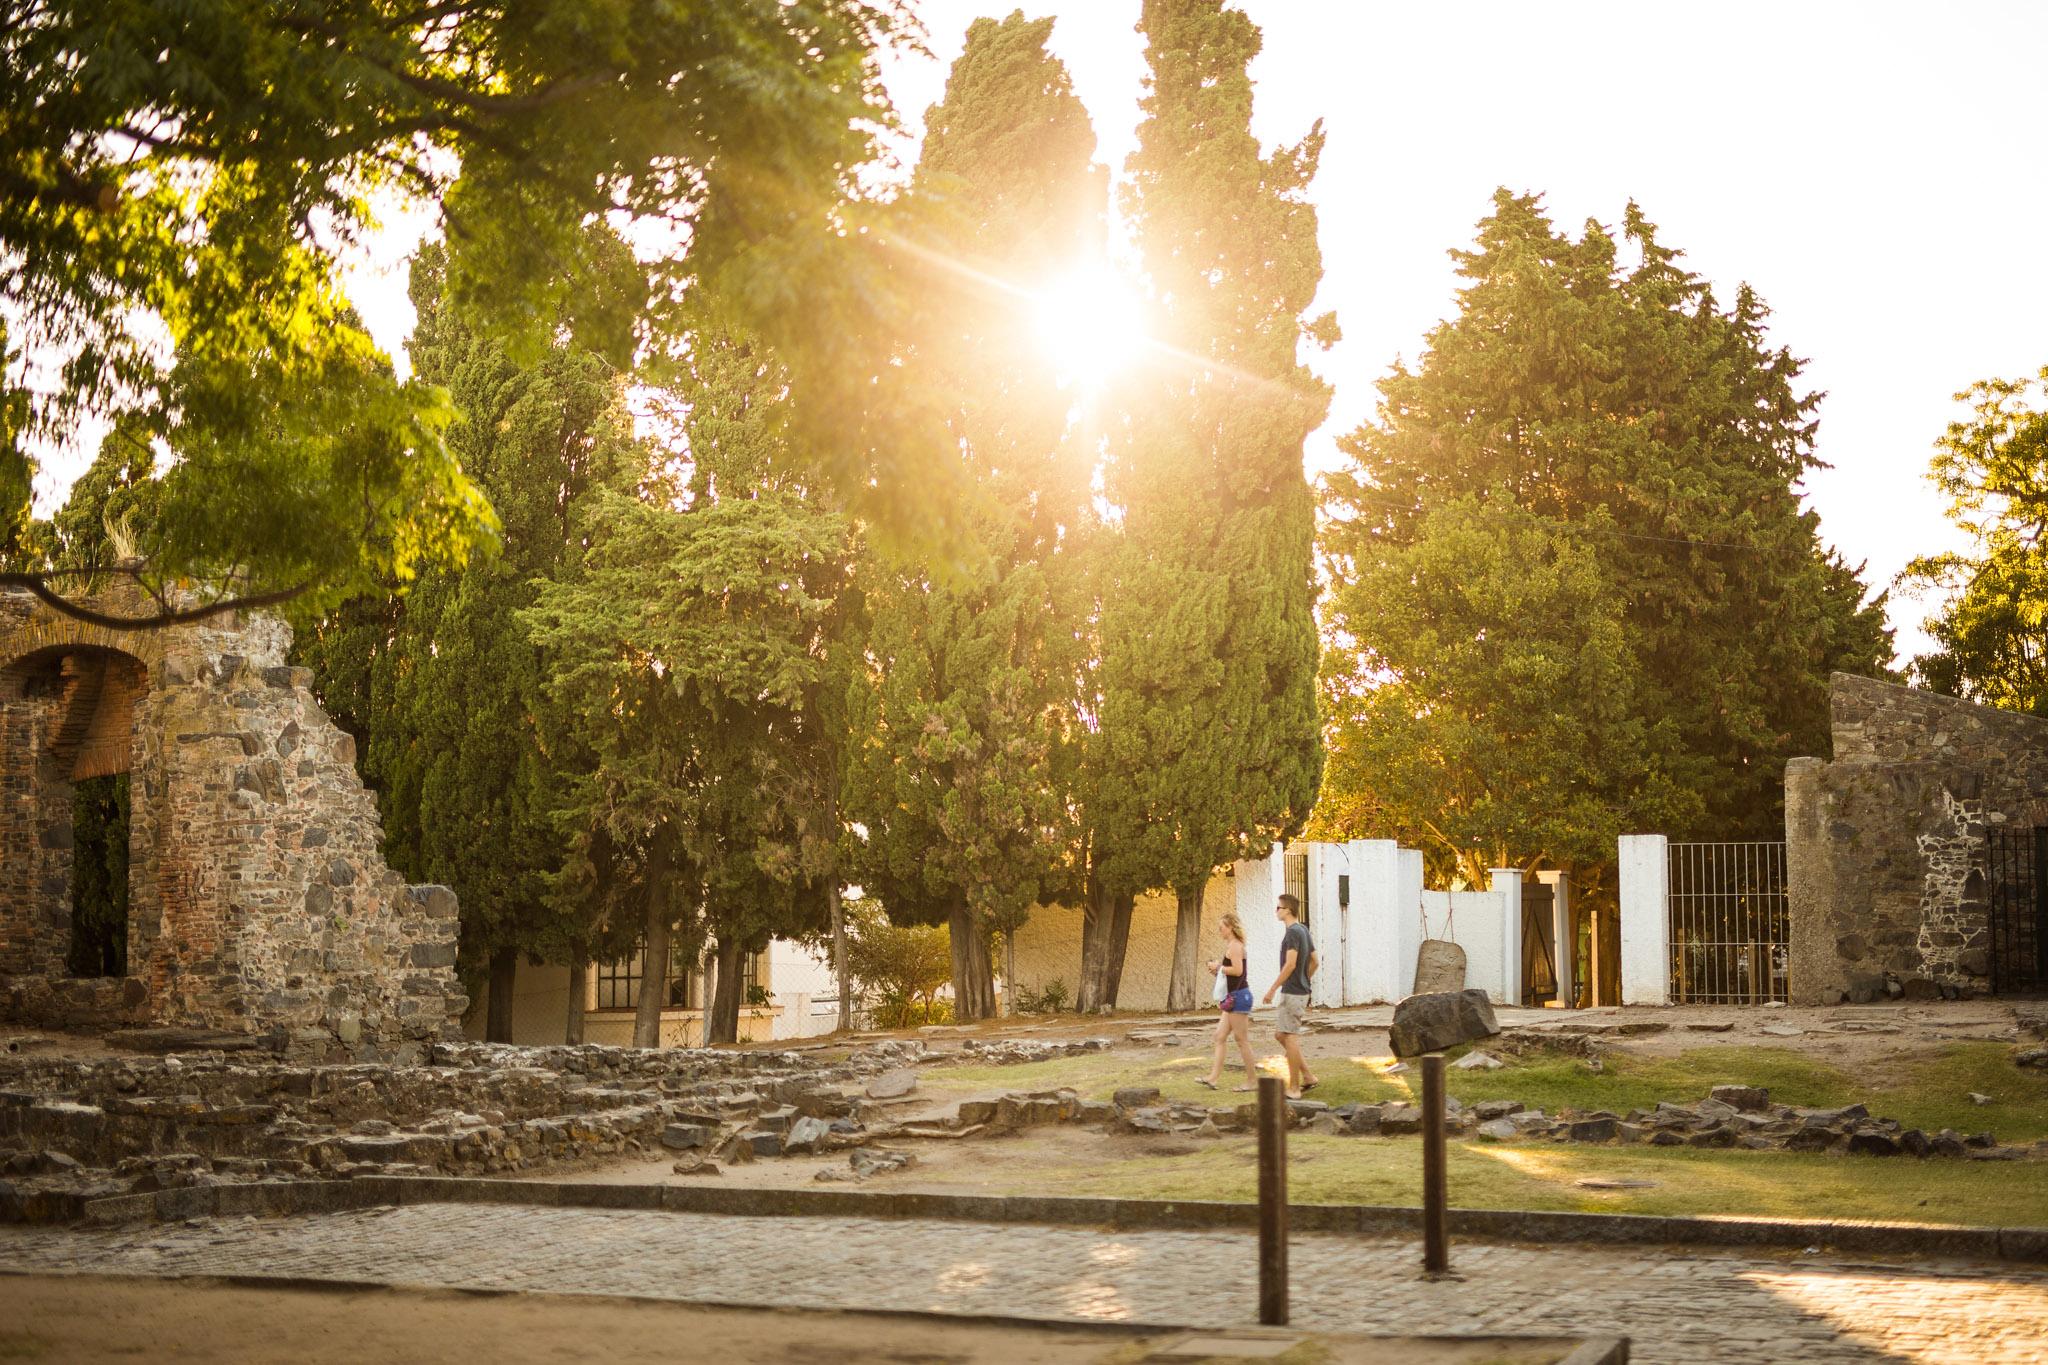 wedding-travellers-destination-photography-overlanding-south-america-uruguay-colonia-del-sacramento-ruins